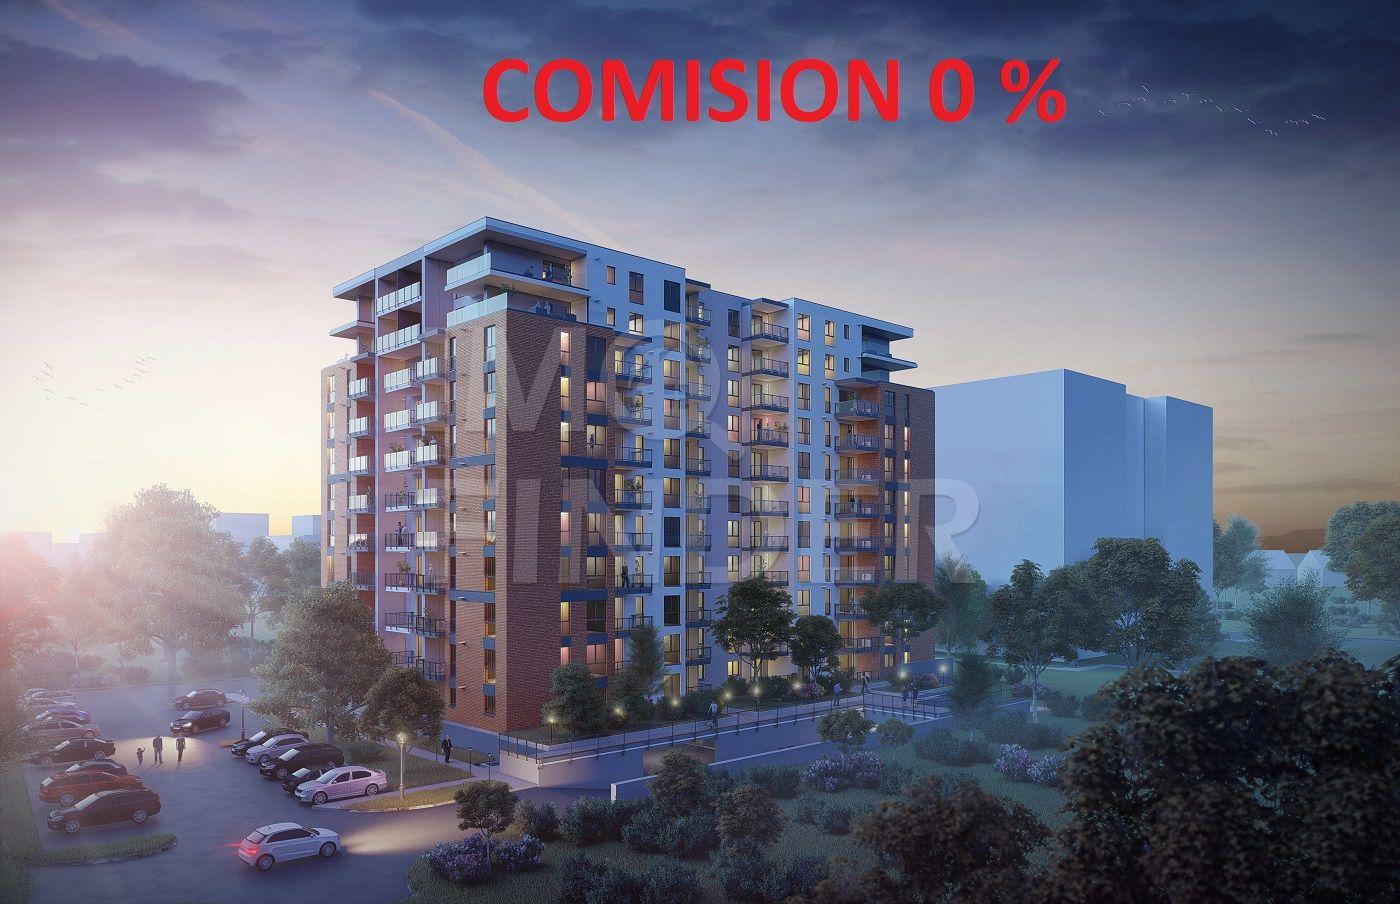 Vanzare apartamente 1, 2 si 3 camere, proiect nou, cartier Buna Ziua